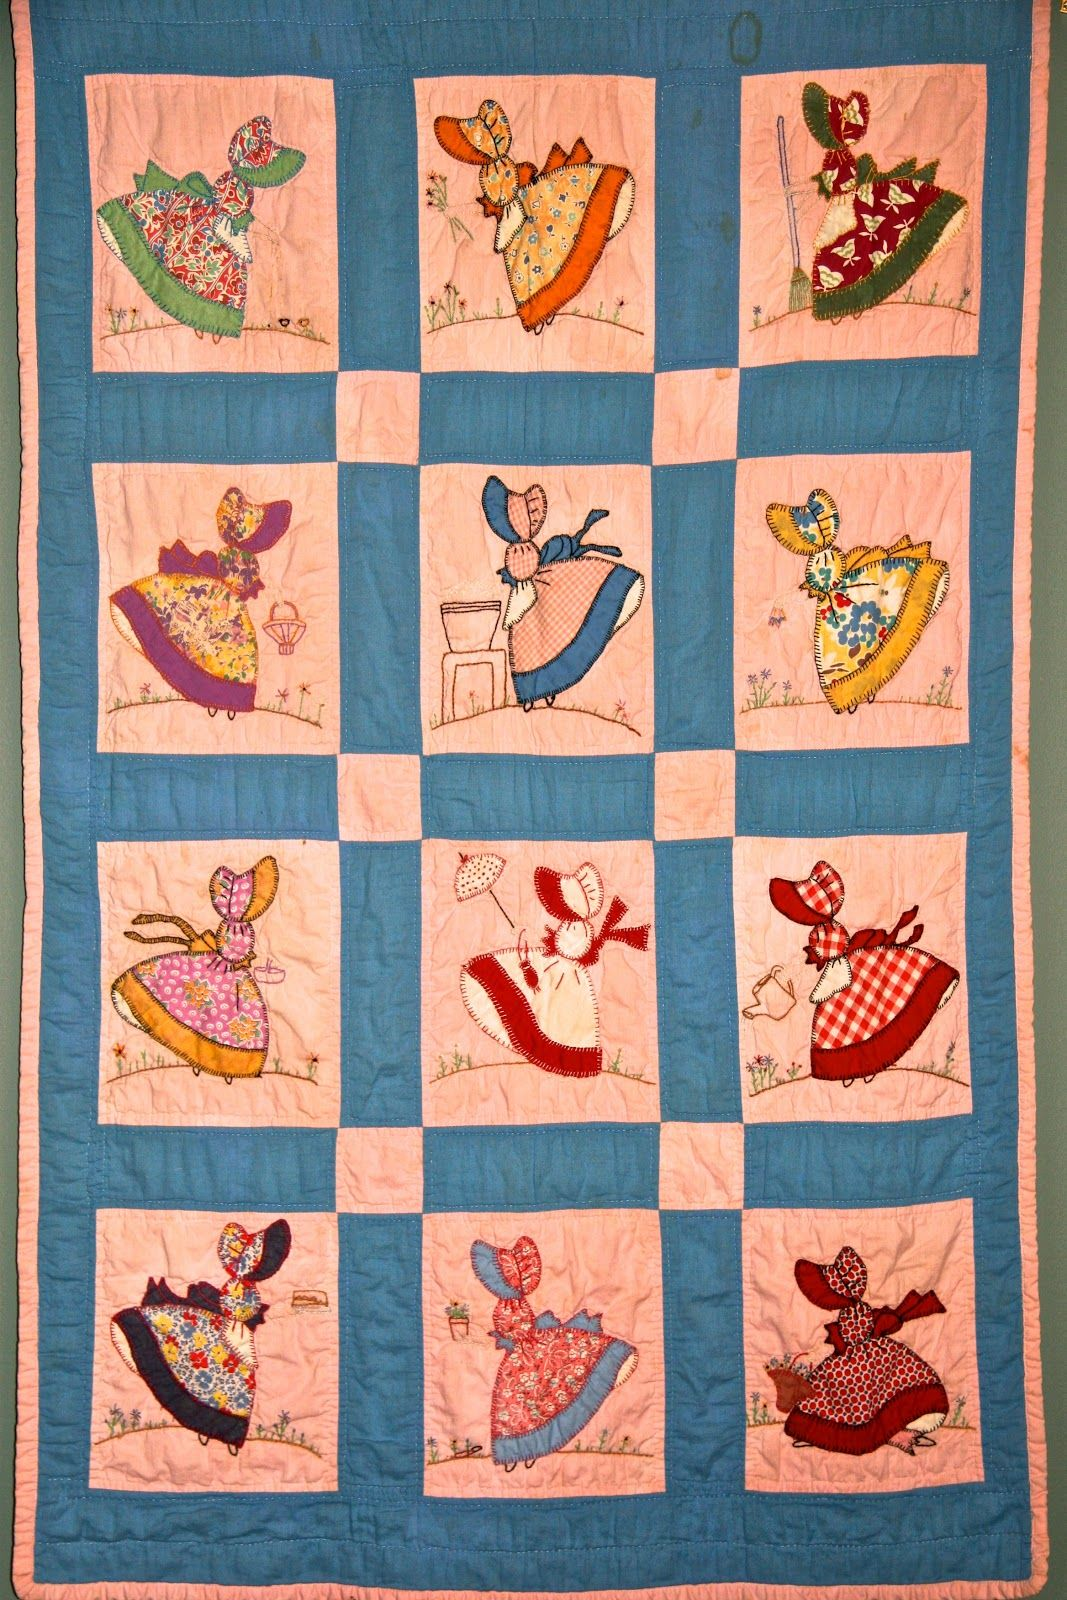 sunbonnet sue|quilt patterns|vintage quilt | Quilting ideas ... : vintage quilt blocks - Adamdwight.com